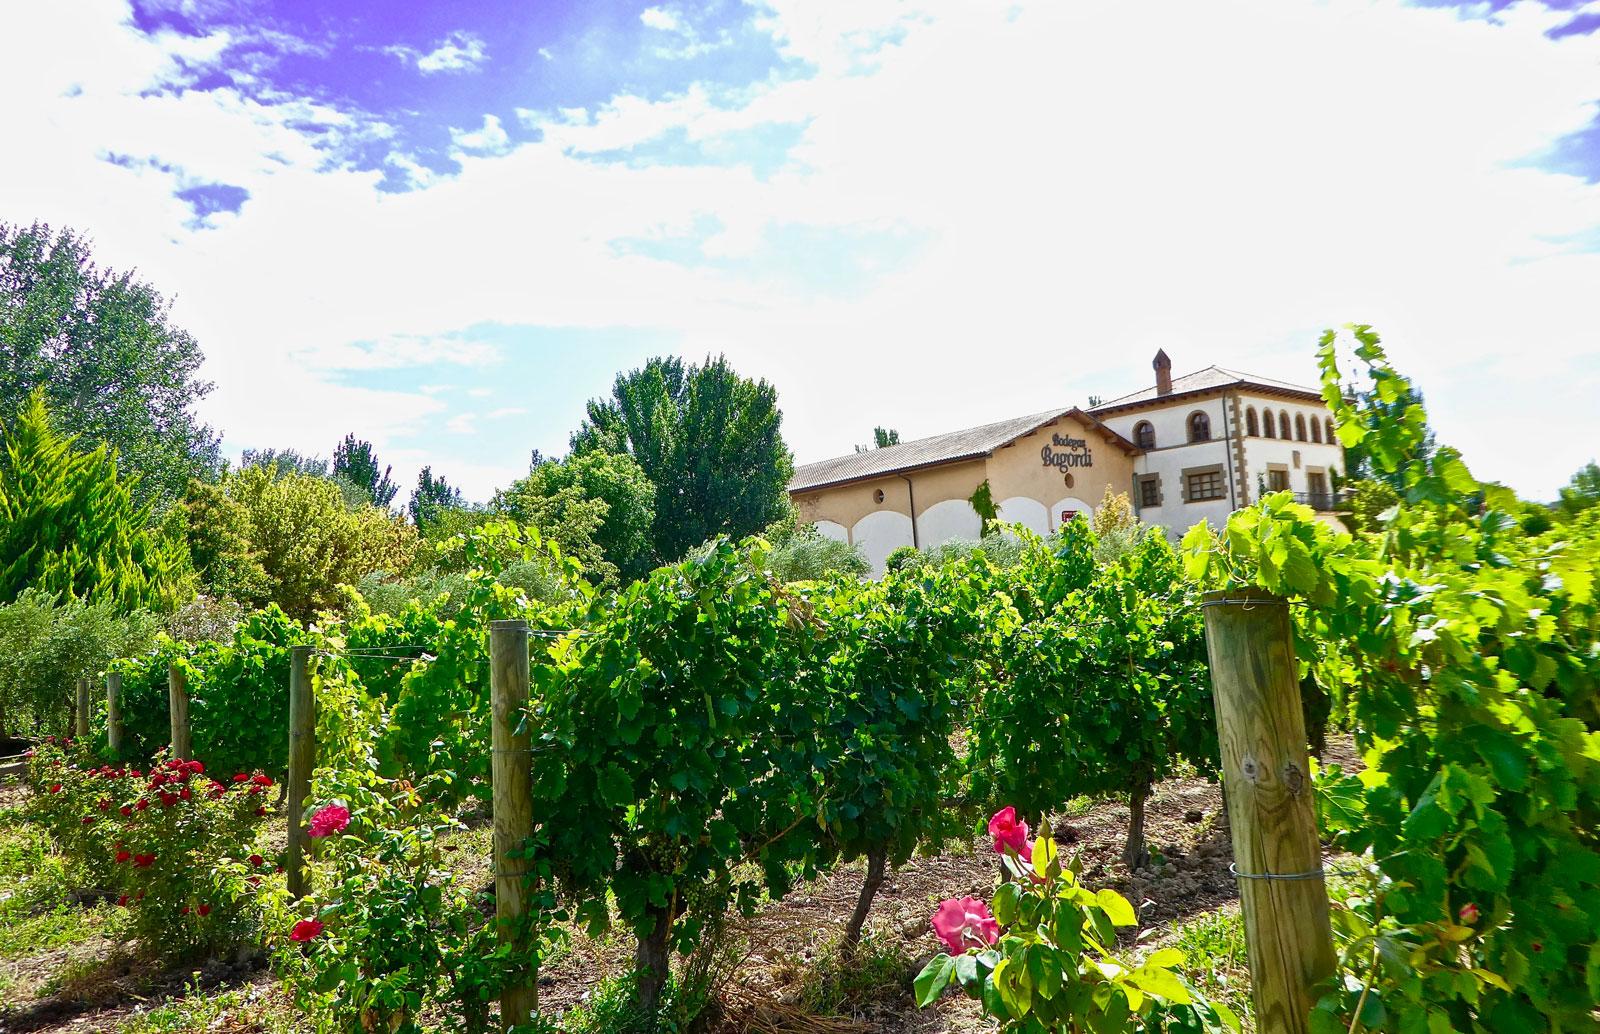 Bodegas Bagordi, pioneros de la viticultura ecológica